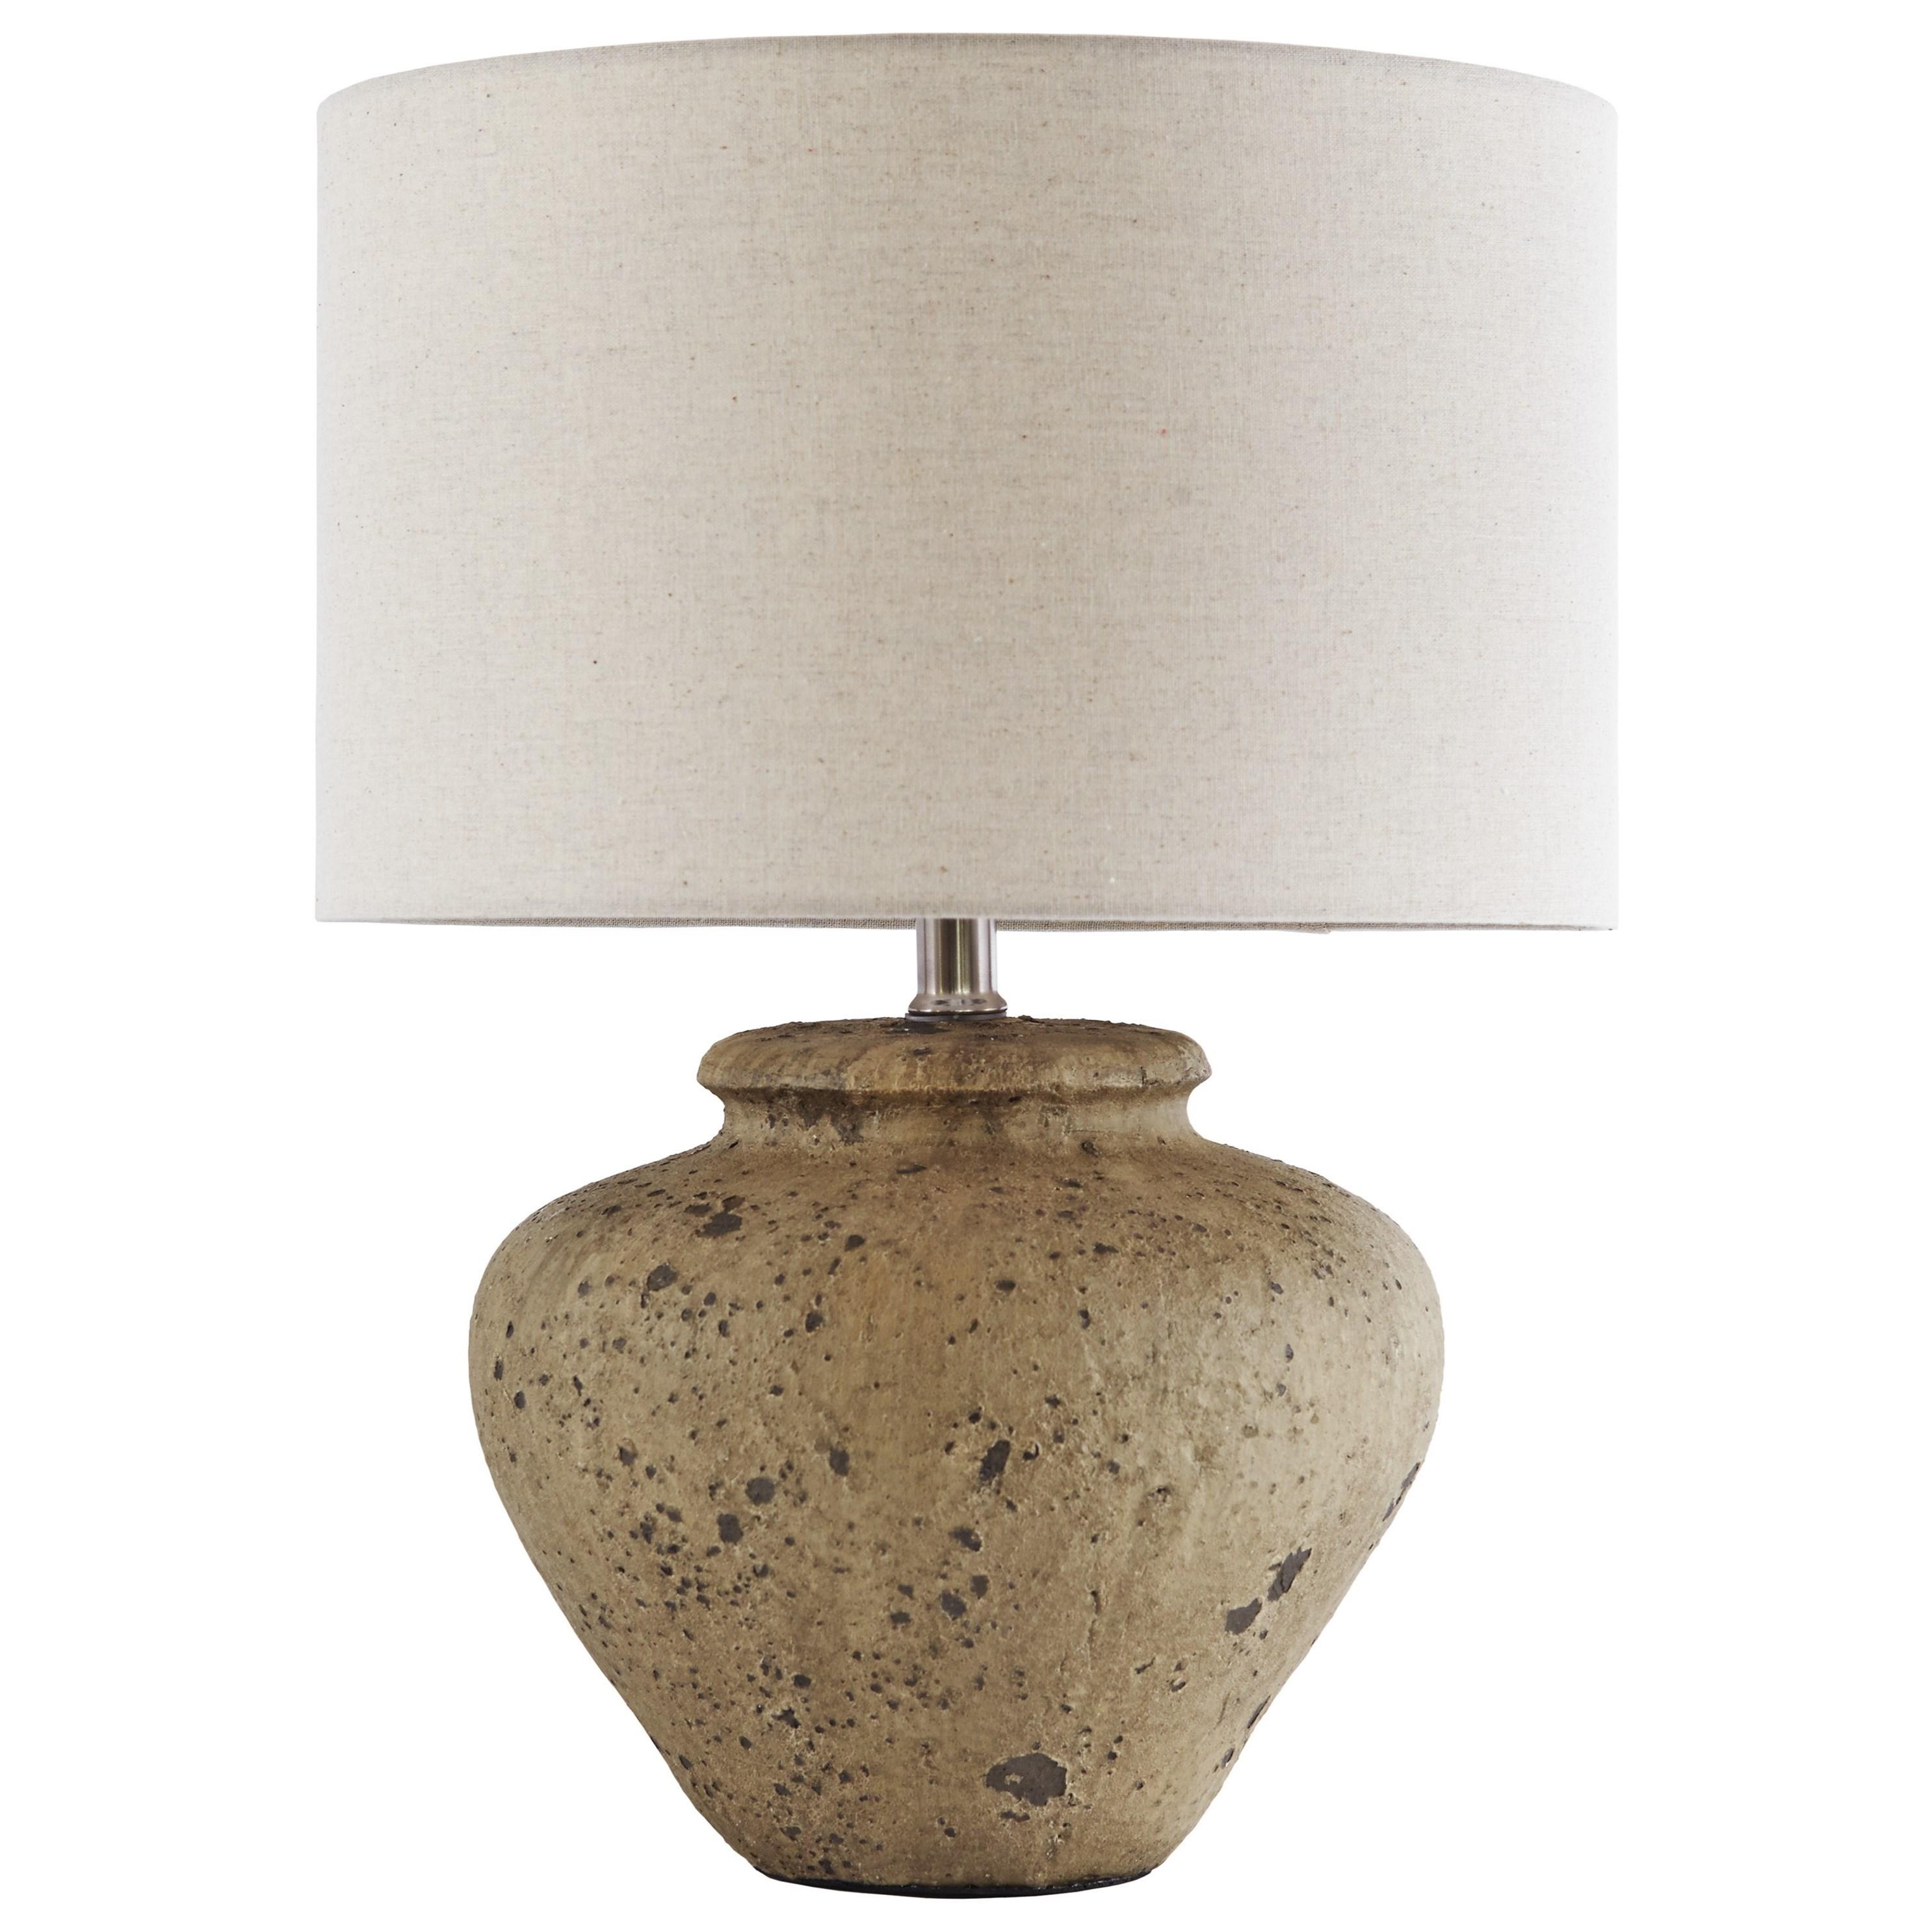 Ashley Signature Design Lamps   Vintage StyleMahfuz Beige Ceramic Table Lamp  ...